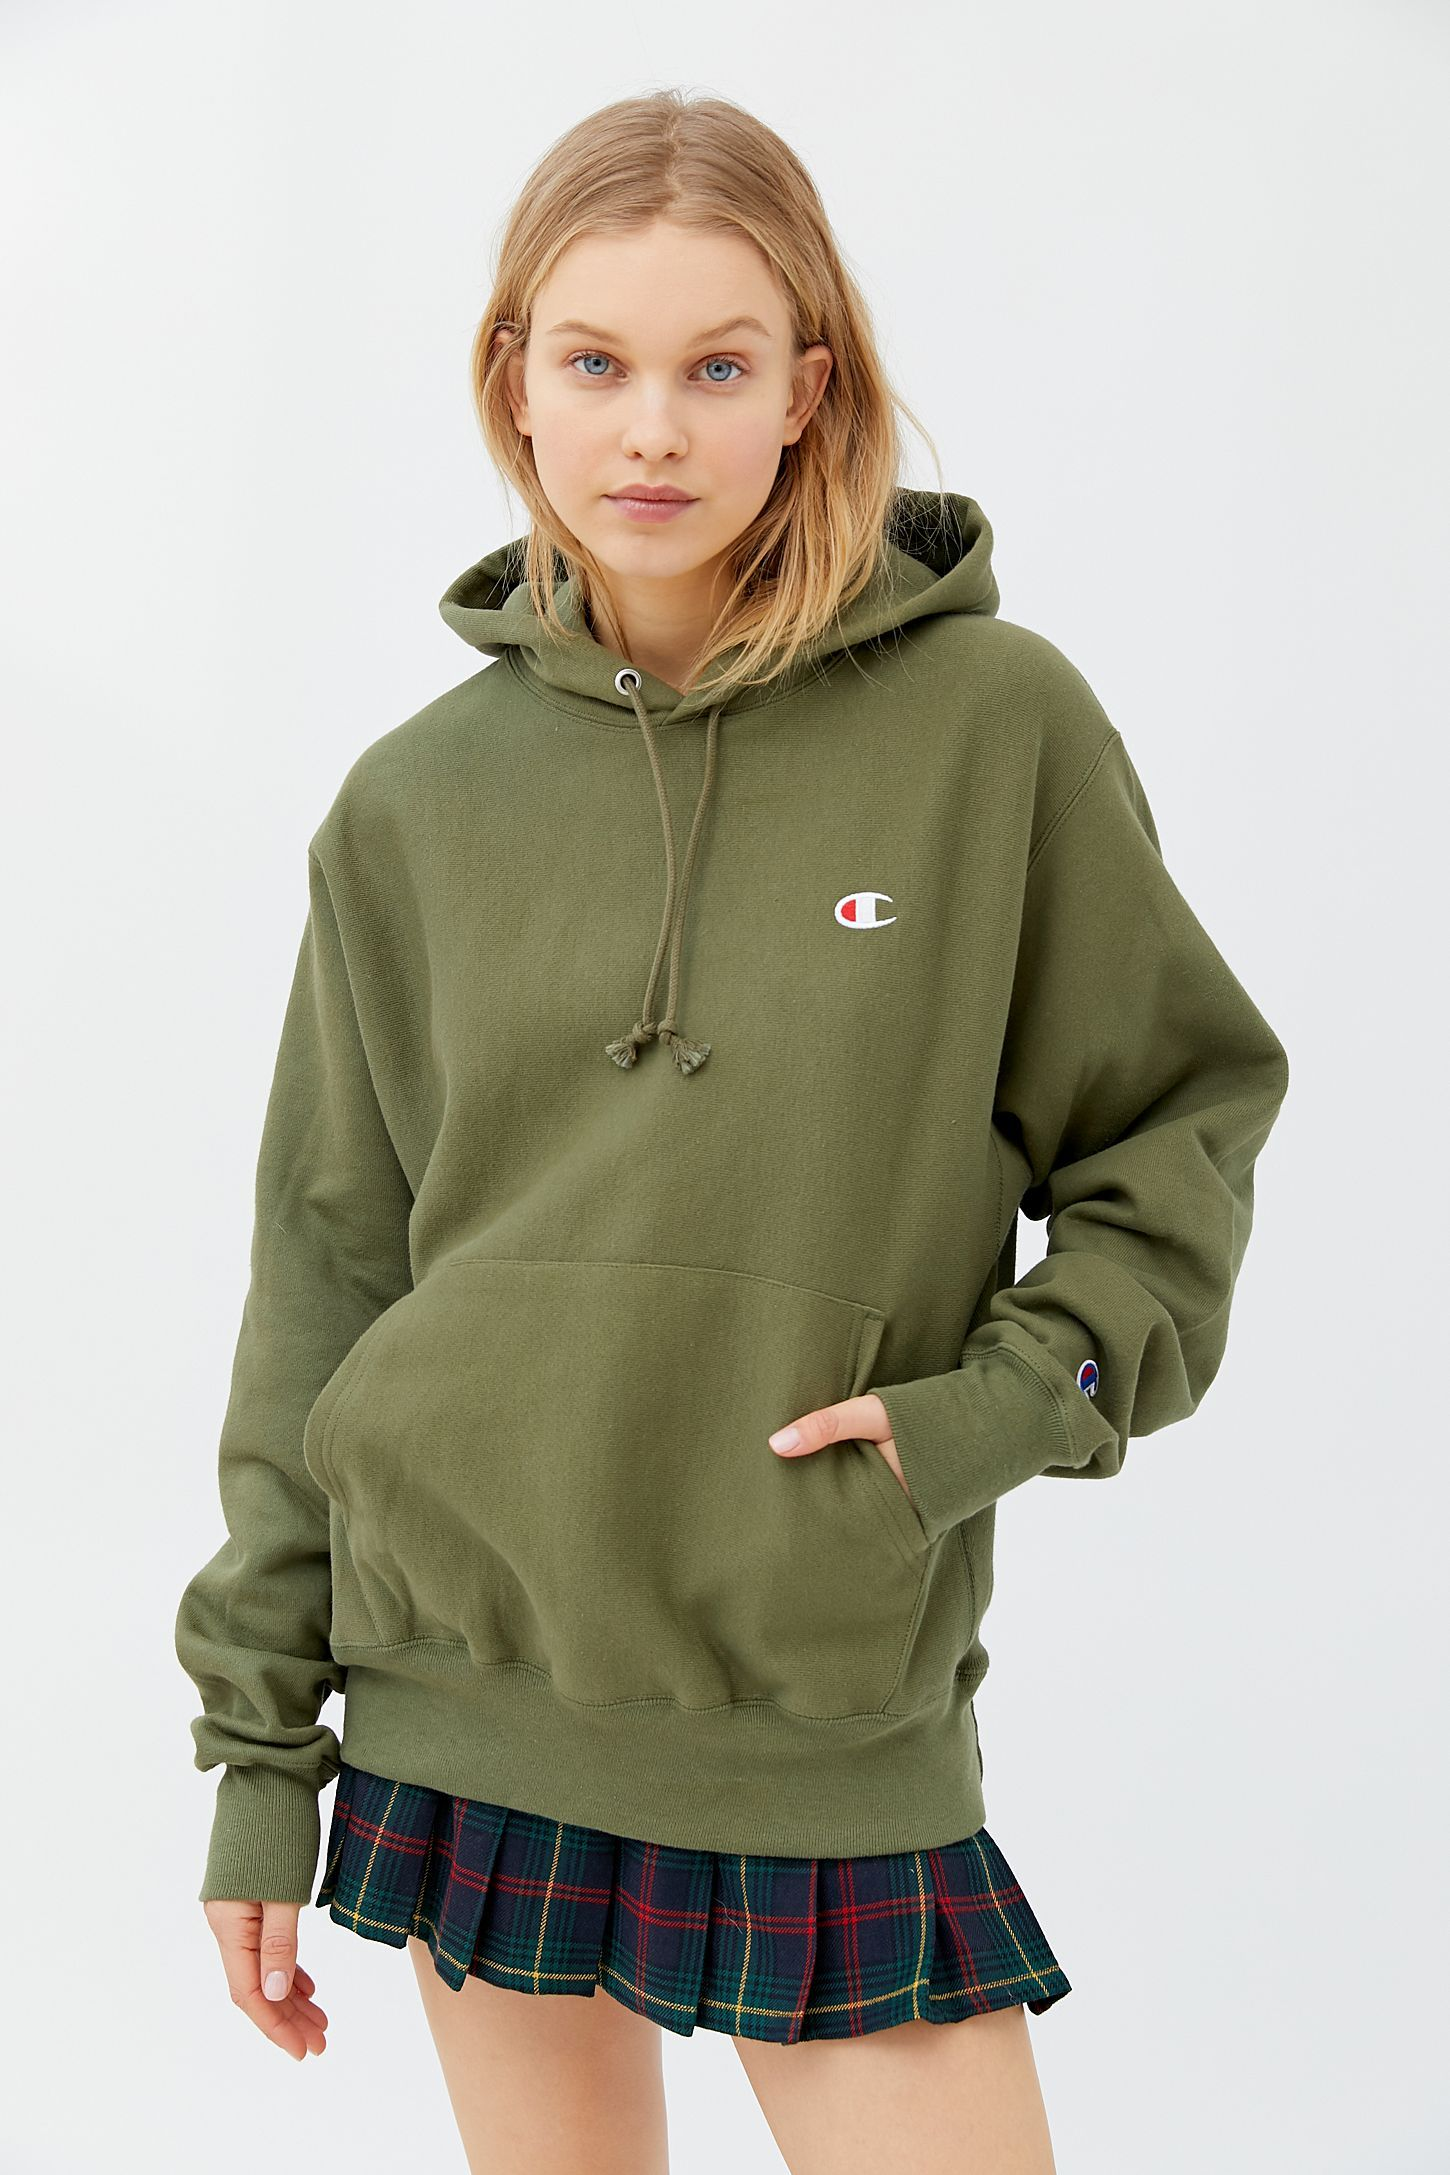 Champion Classic Logo Patch Hoodie Sweatshirt Sweatshirts Hoodie Hoodies Sweatshirts [ 2175 x 1450 Pixel ]